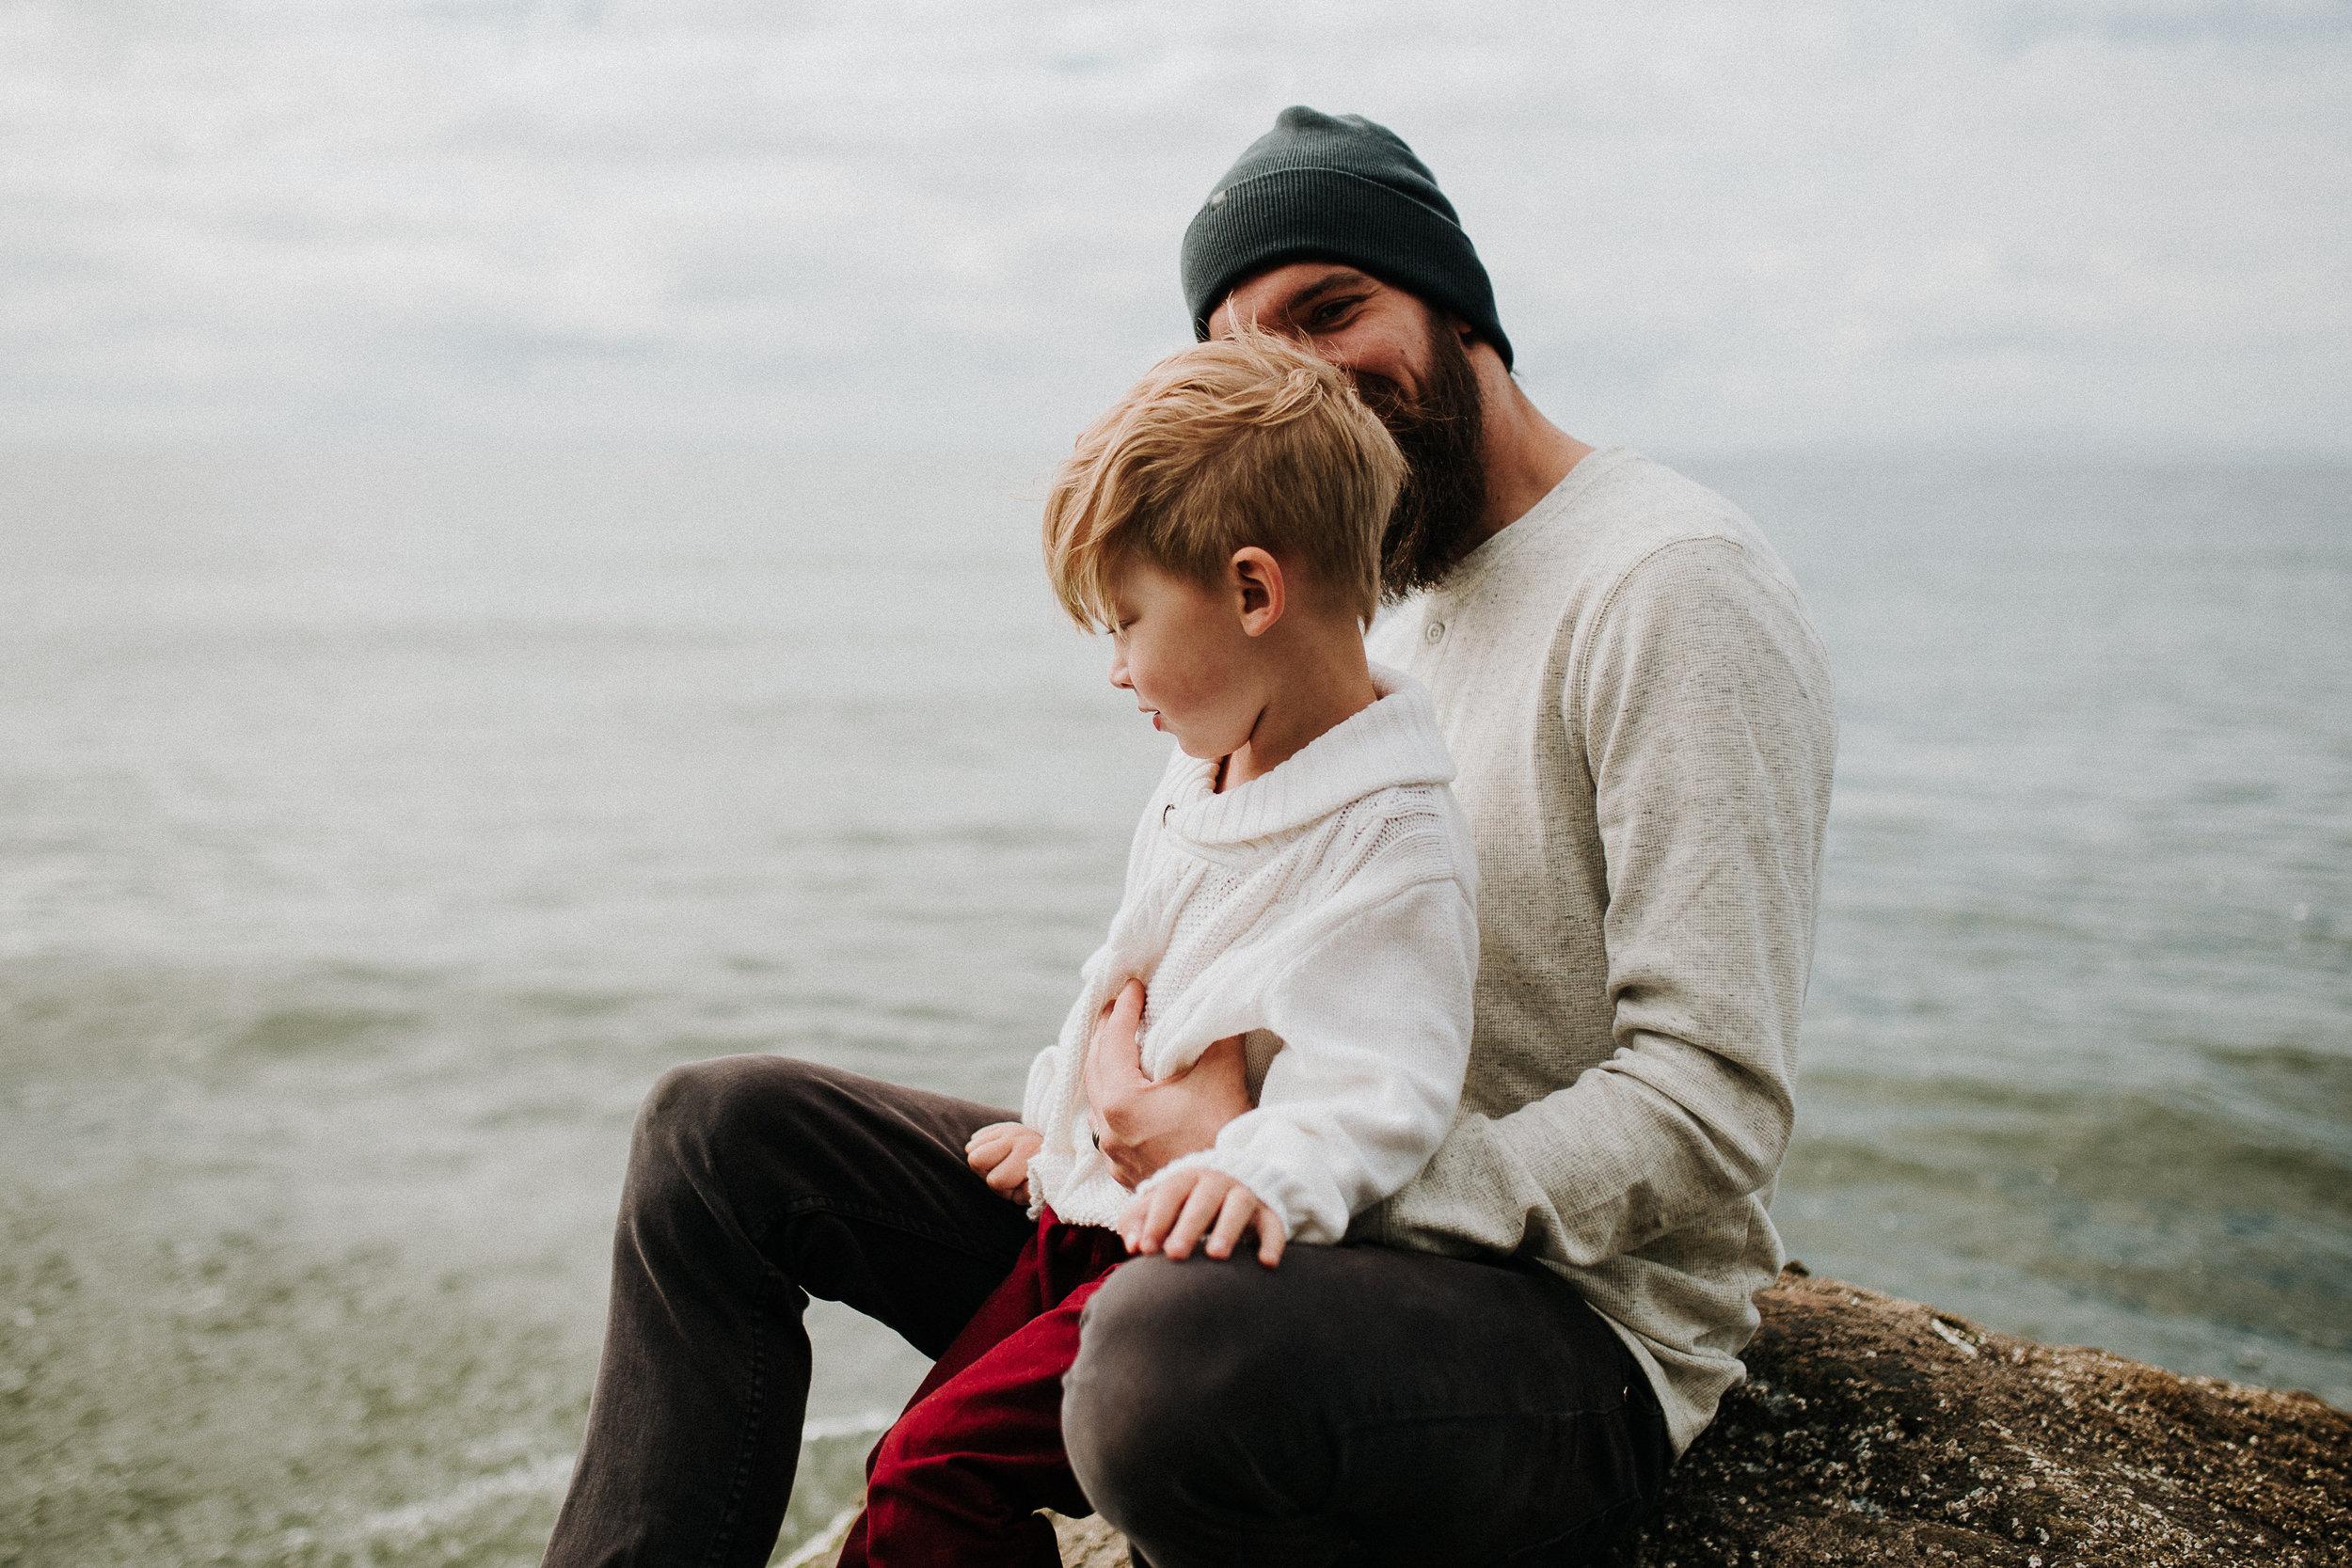 Family-Photographer-Bellingham-WA-Brianne-Bell-Photography-(Miller)120.jpg